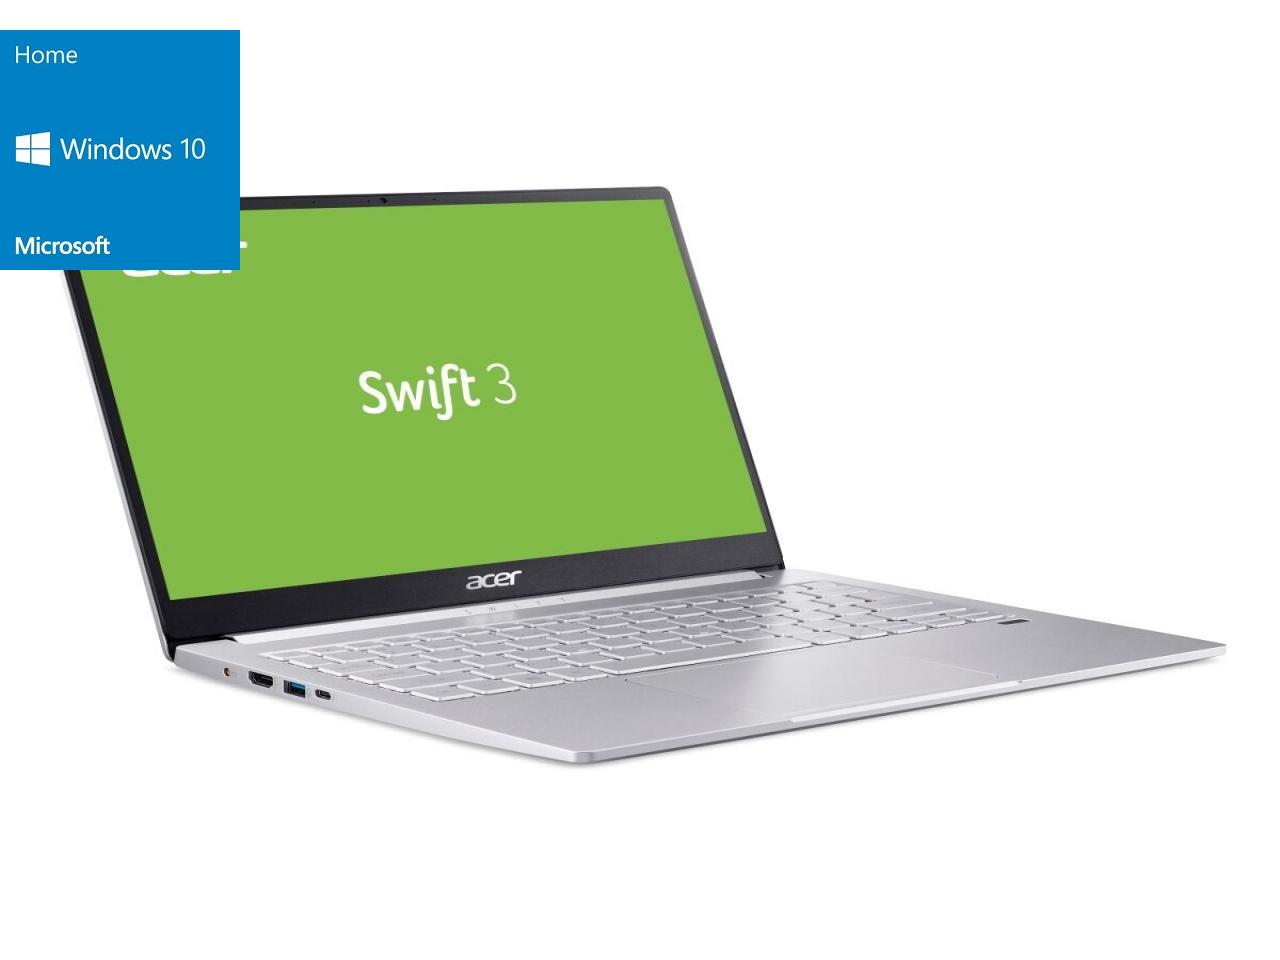 Acer Acer Swift 3 SF313-52-71Y7  - shop.bb-net.de